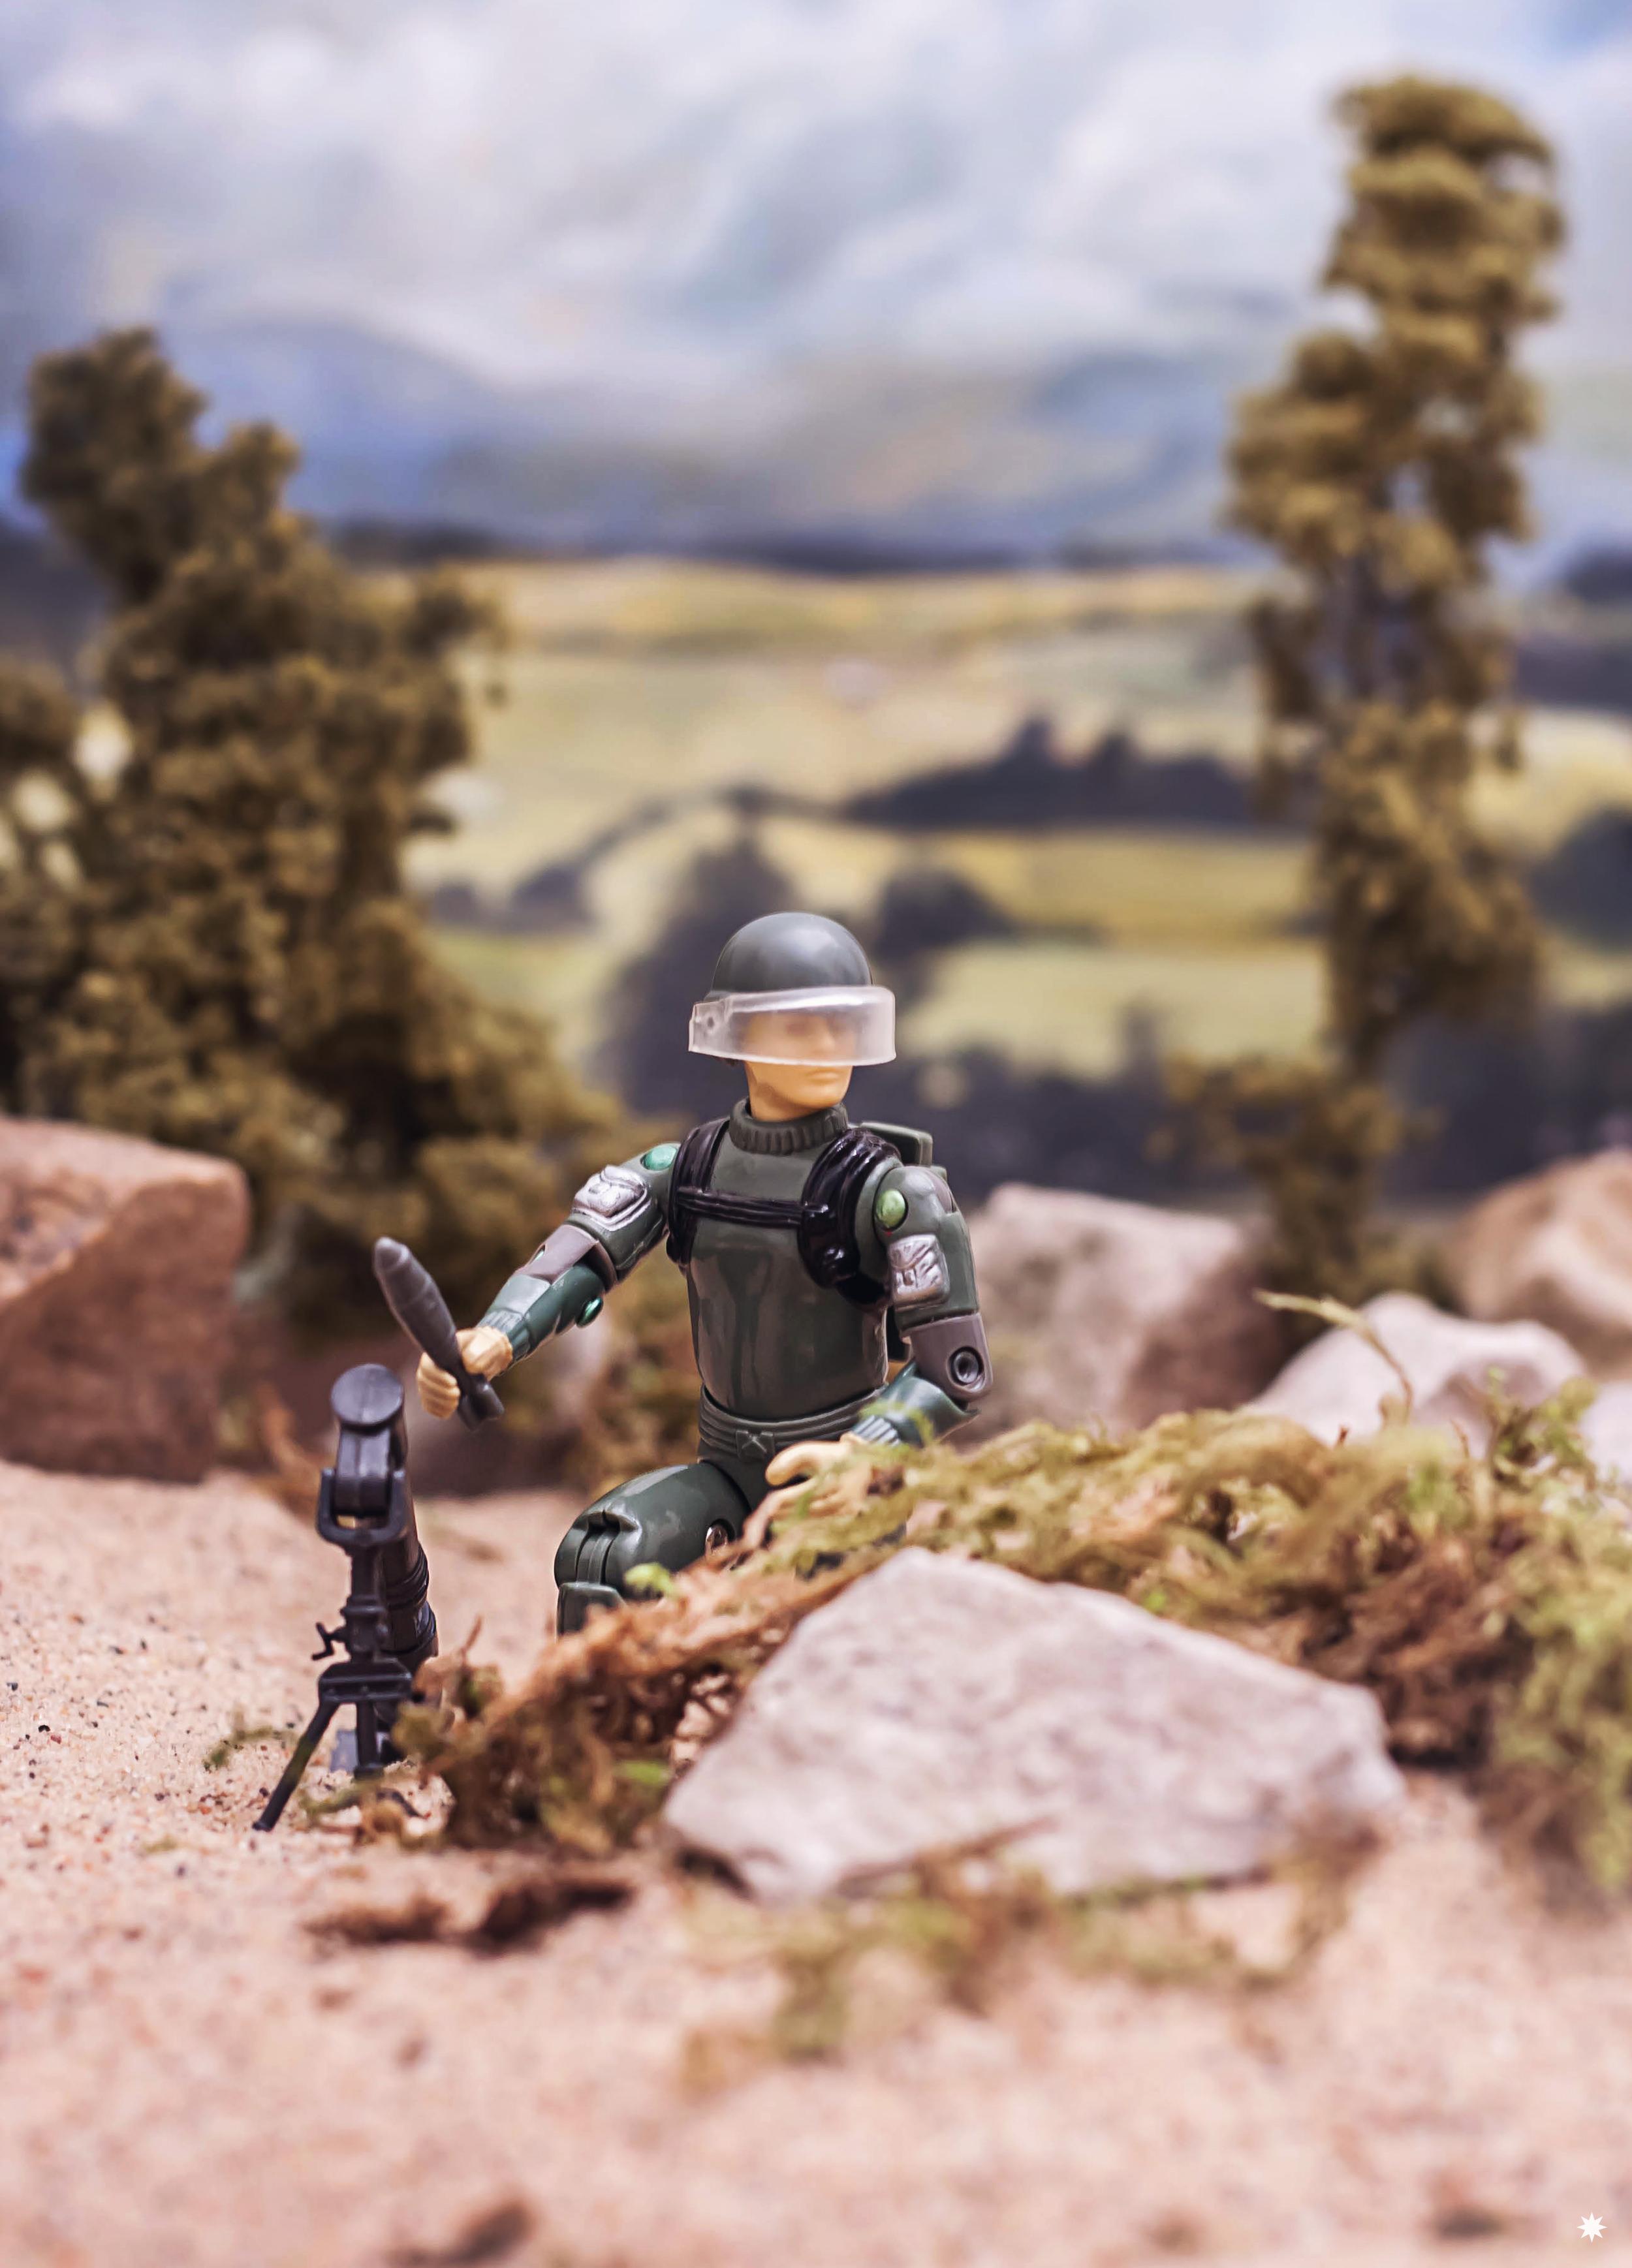 short-fuze-gijoe-action-figure-toy-photography-paul-panfalone-diorama.jpg